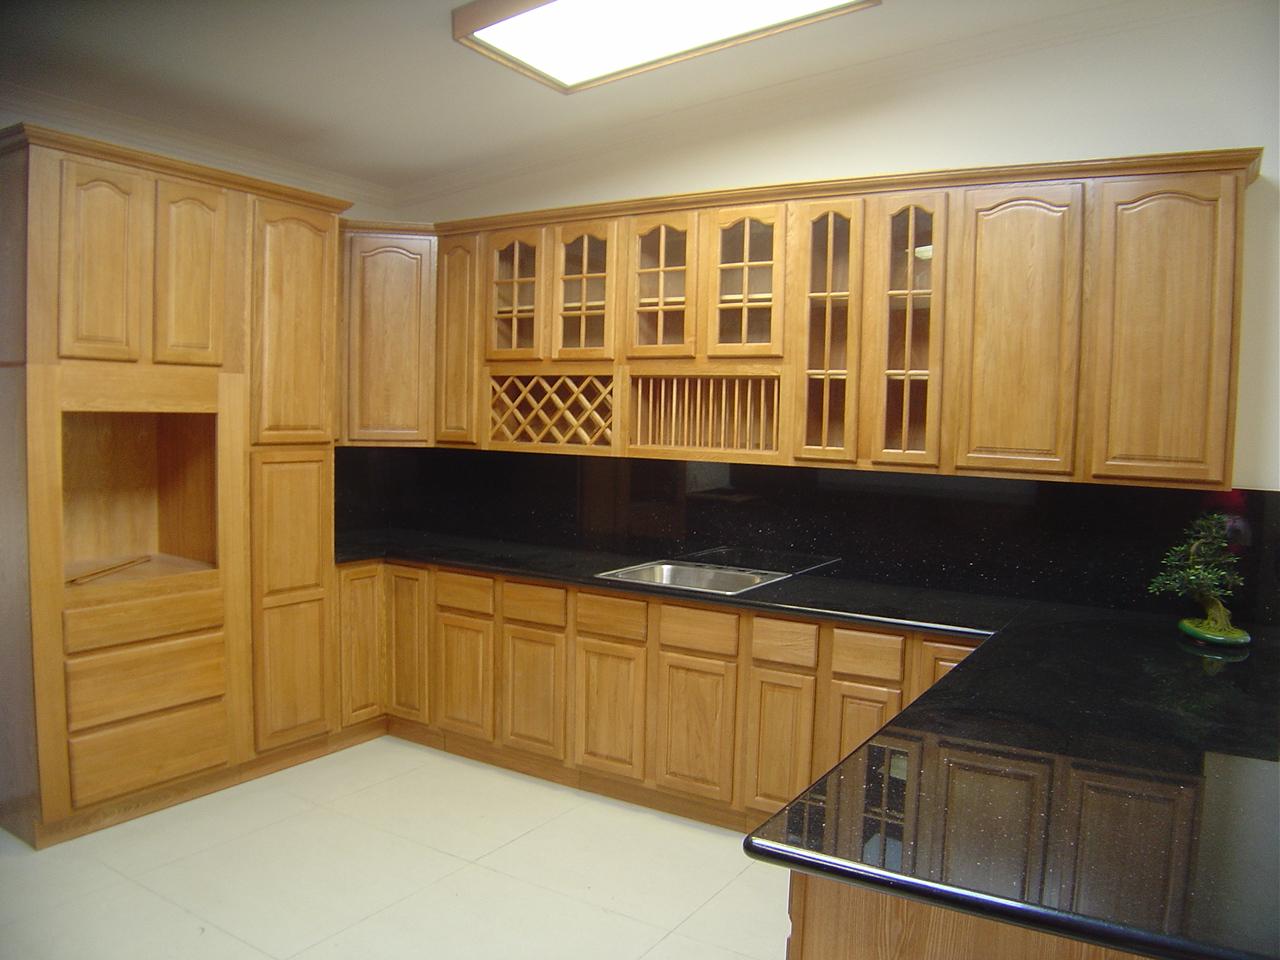 Wine decor kitchen accessories Photo - 1